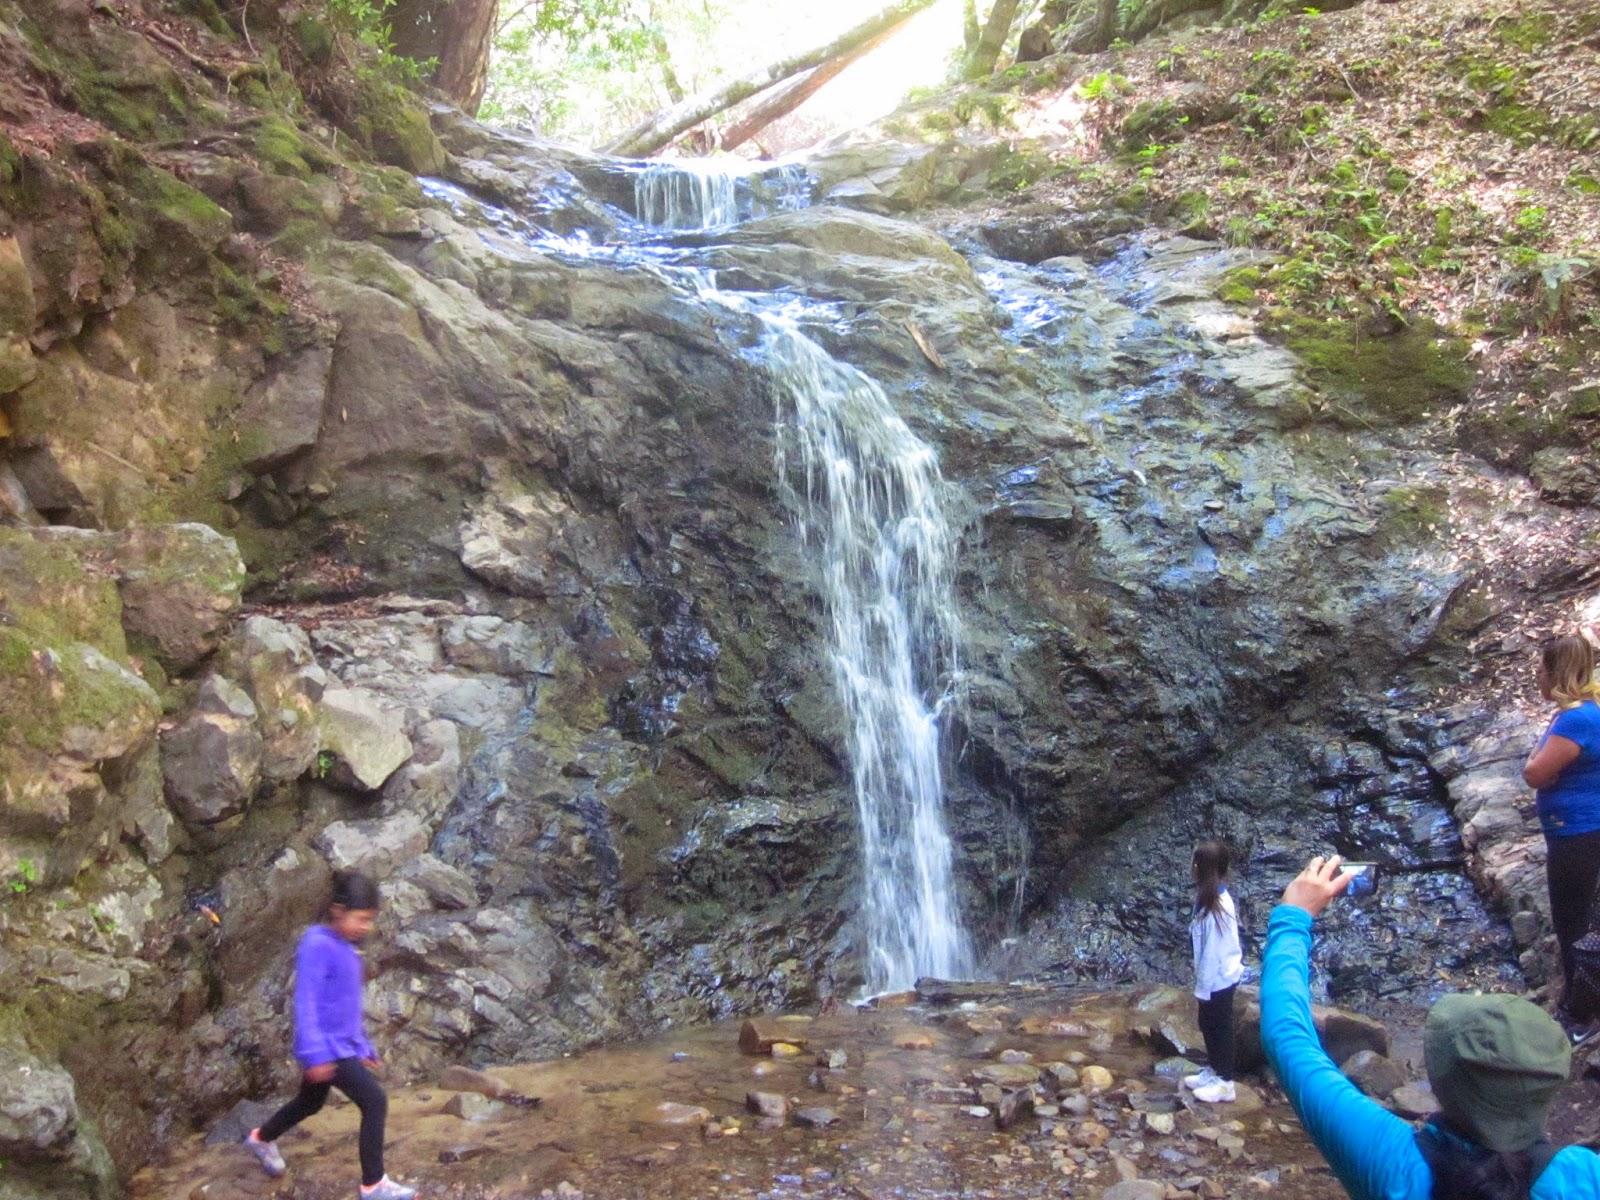 Santa Cruz Mountains Trails: Uvas Canyon County Park